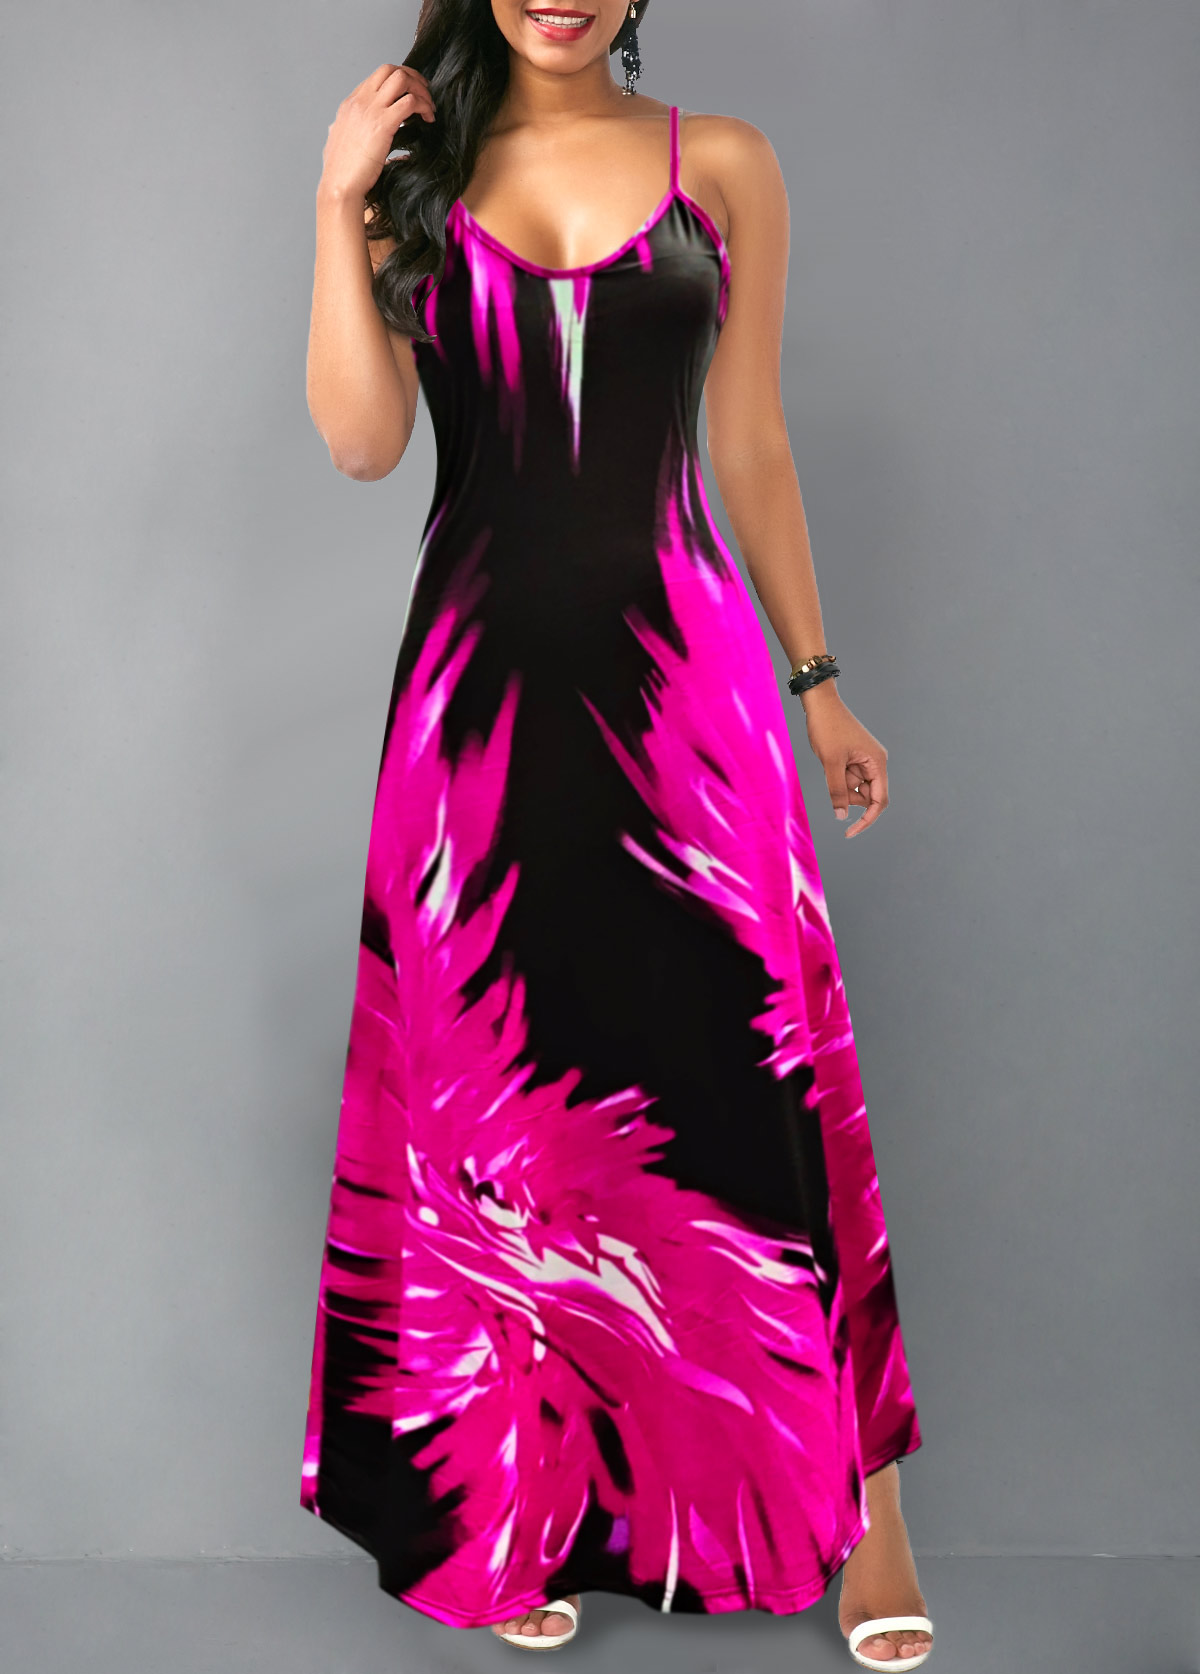 Flame Print Spaghetti Strap Maxi Dress